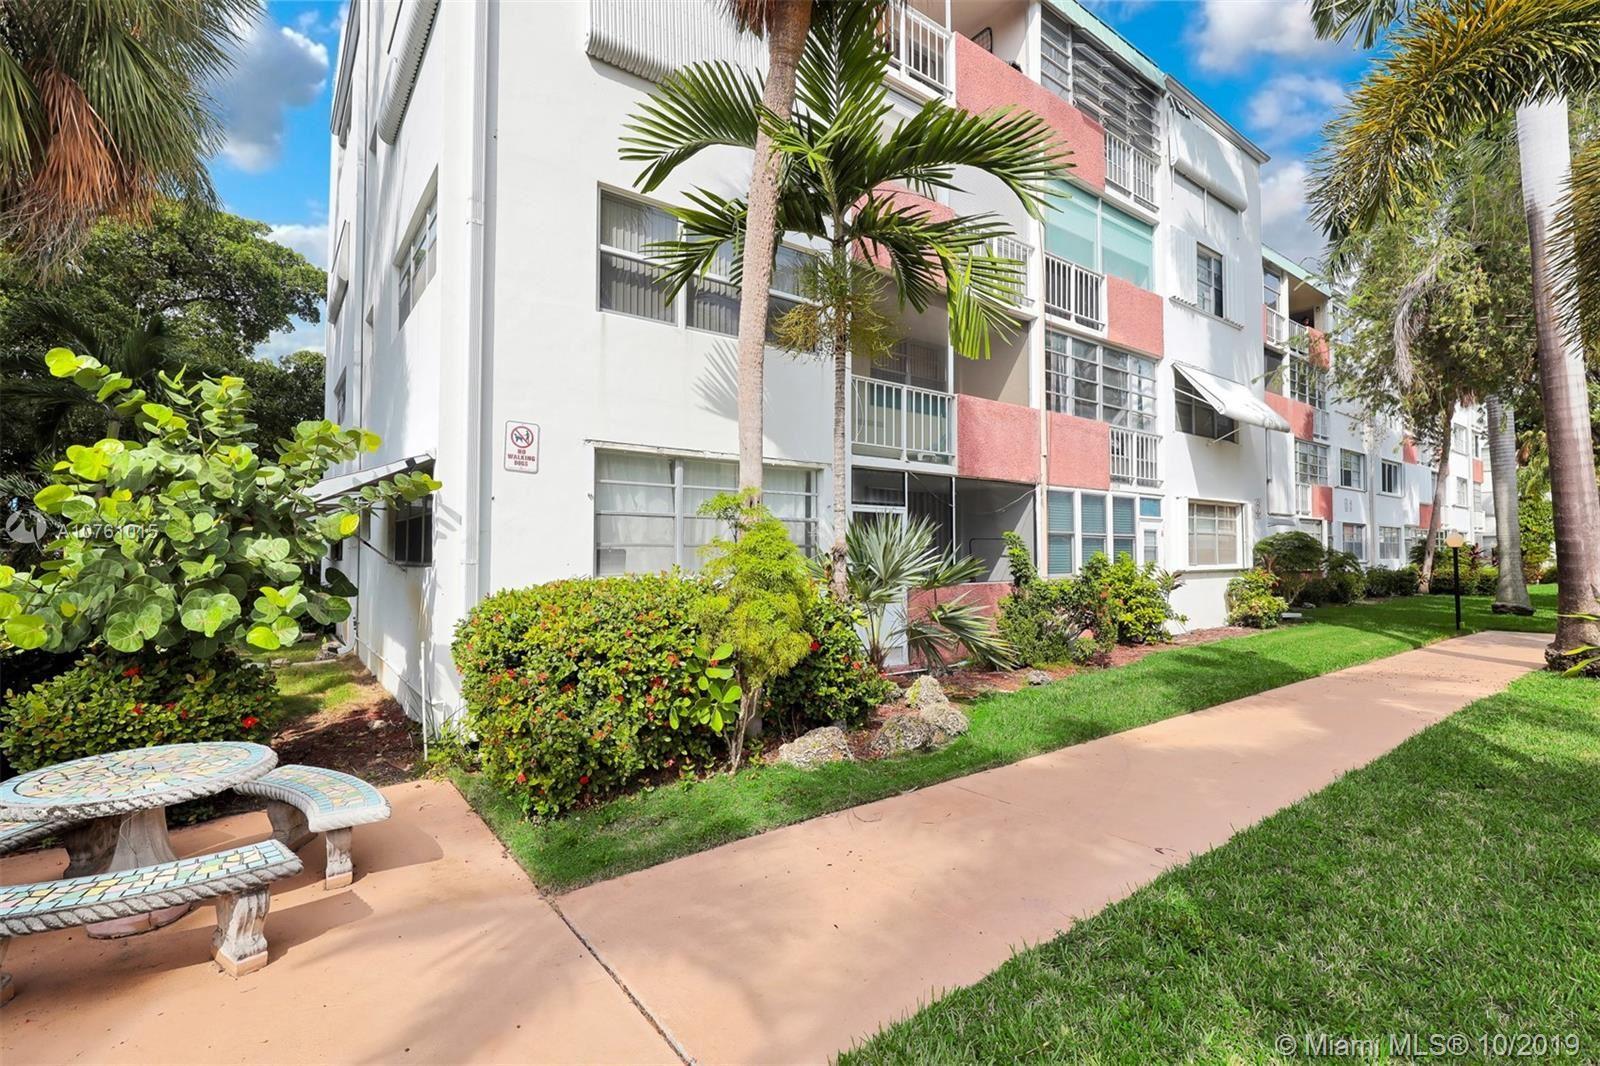 1333 E Hallandale Beach Blvd #129, Hallandale Beach, FL 33009 - #: A10761015